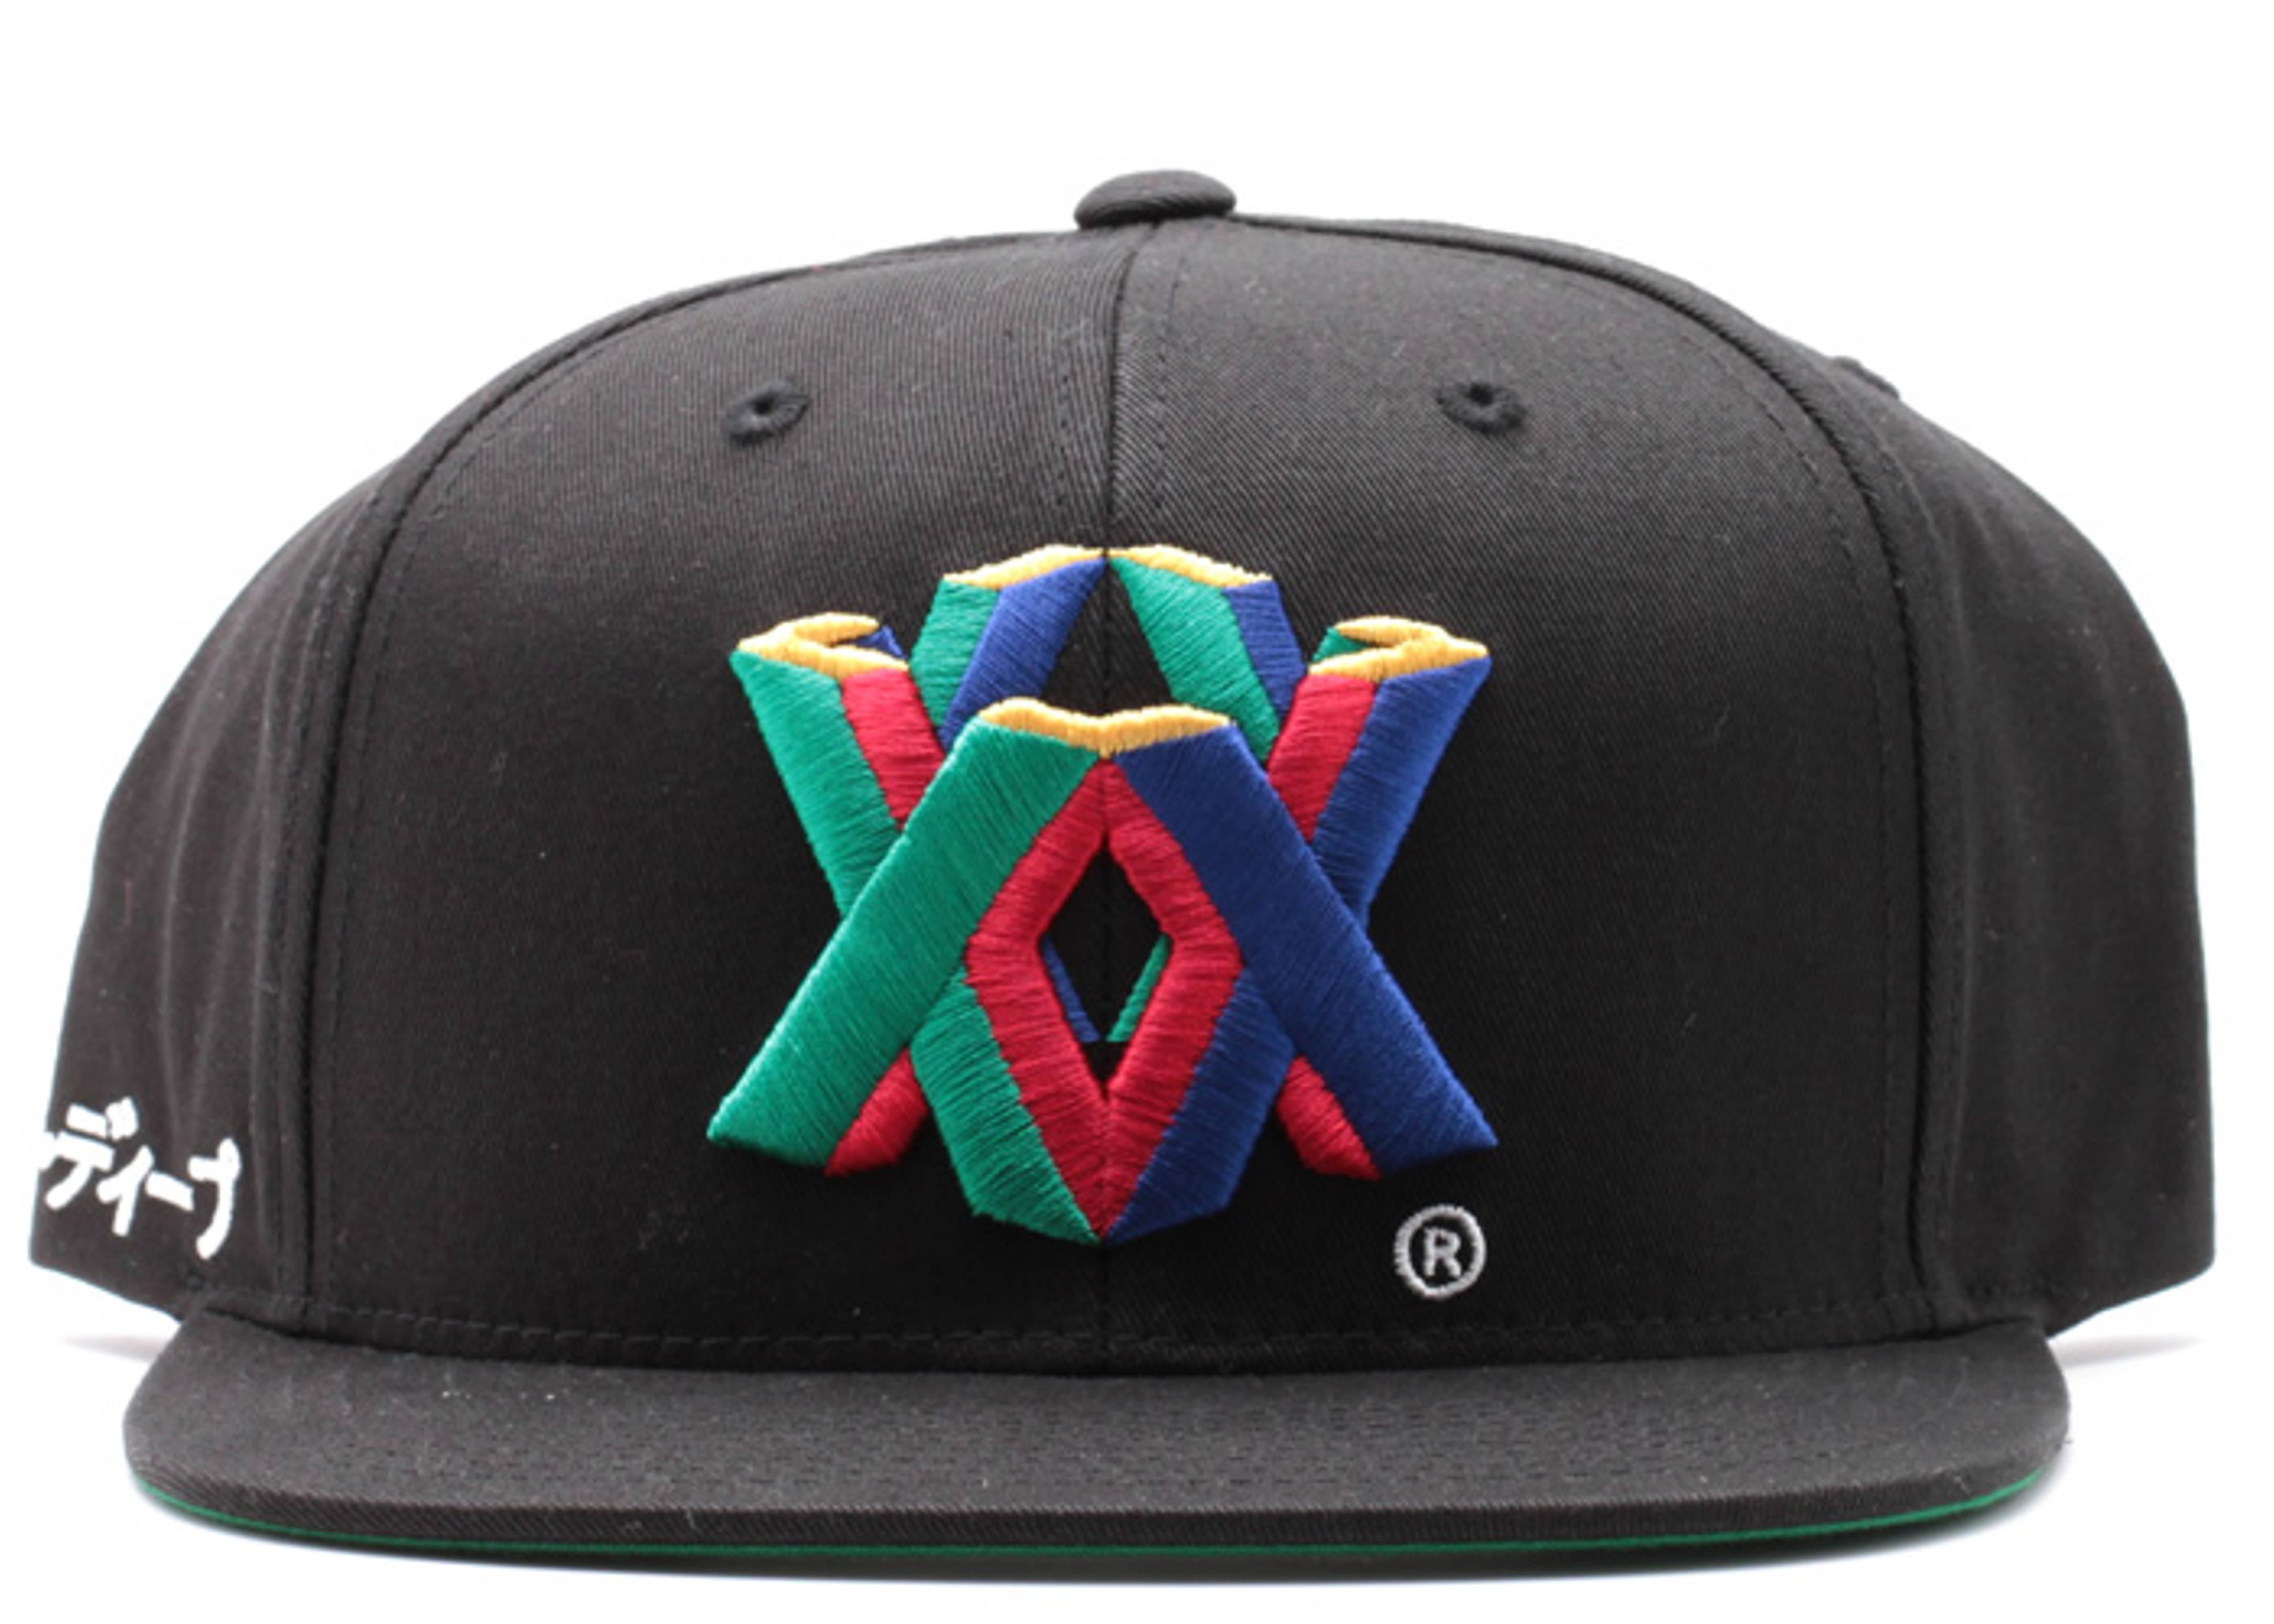 x64 snap-back